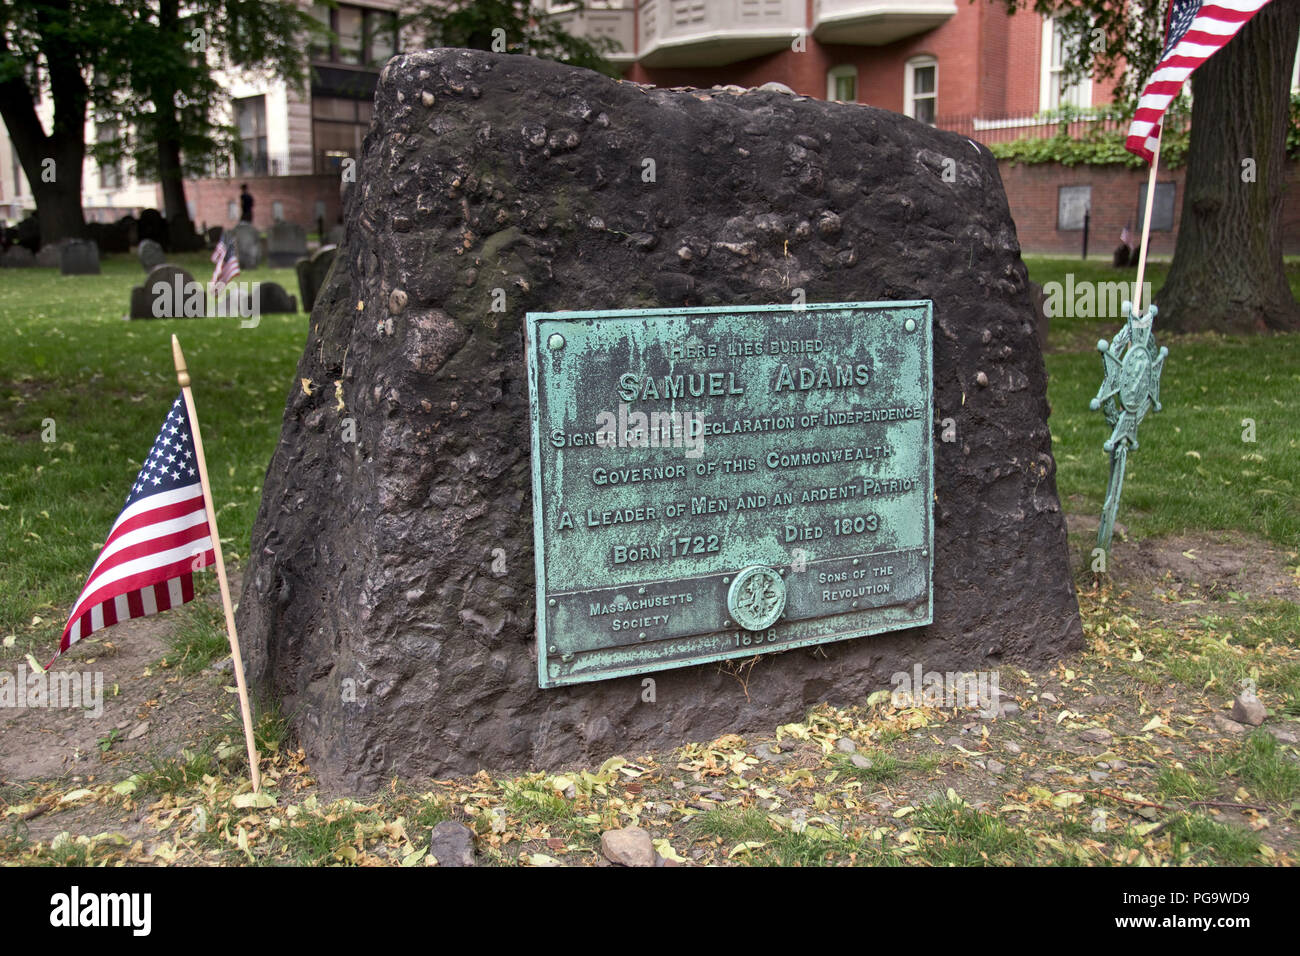 American patriot Sam Adams' grave in the Granary Burying Ground, Boston, Massachusetts. - Stock Image